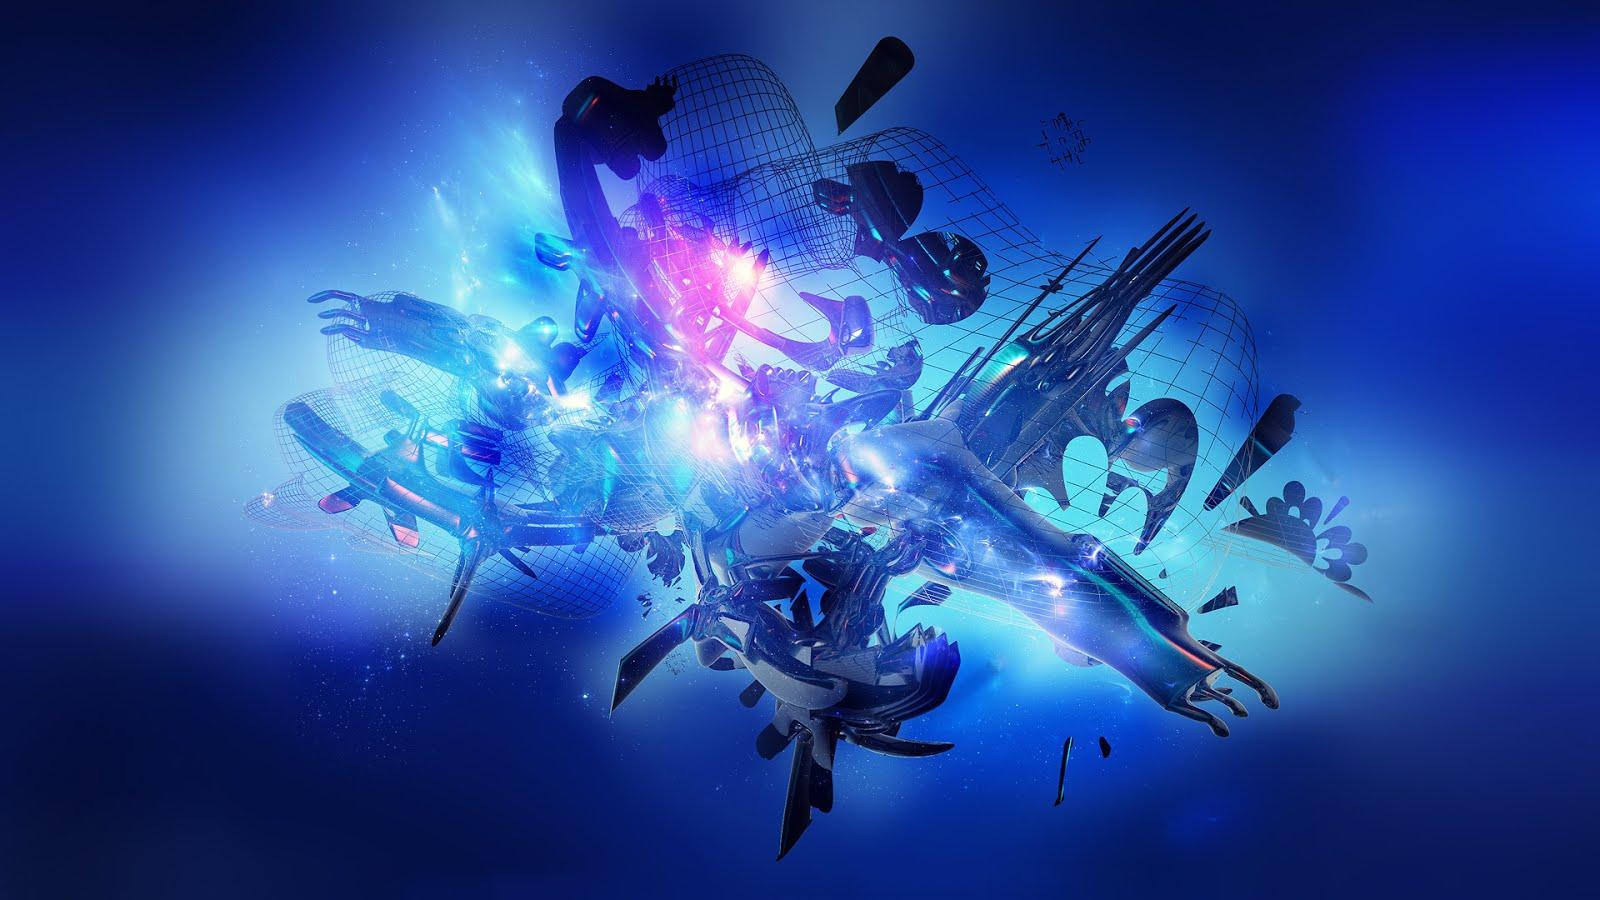 Wallpaper Hd 1080p Blue